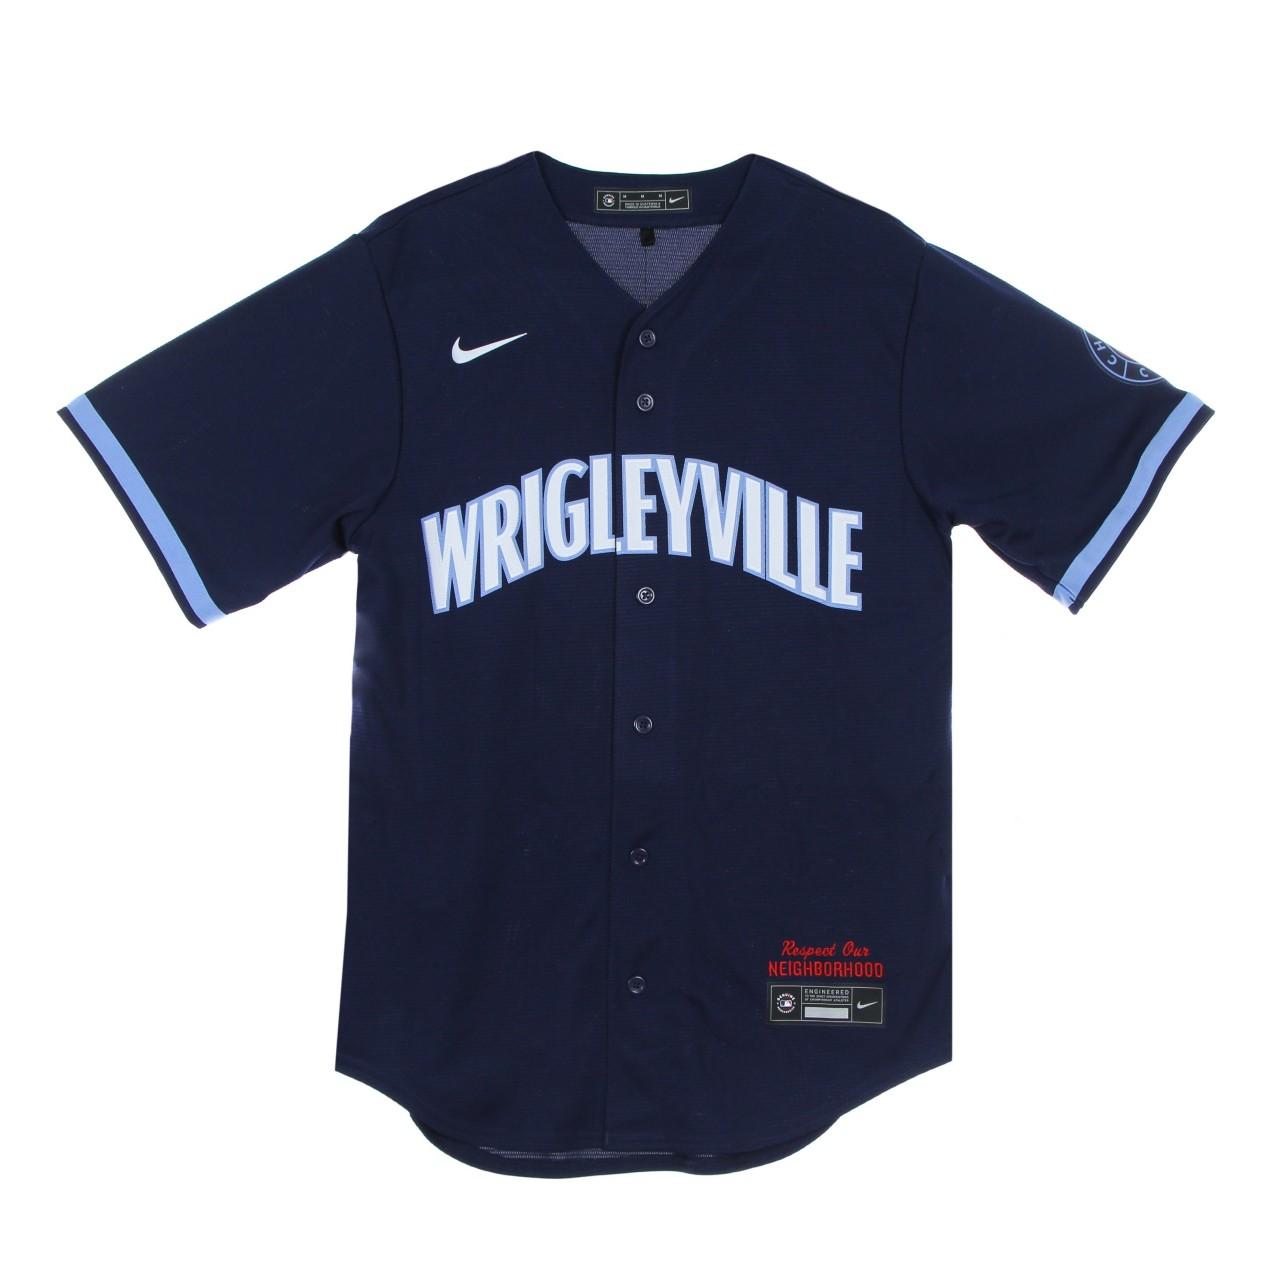 NIKE MLB MLB OFFICIAL REPLICA JERSEY CITY CONNECT CHICUB T770-EJCC-EJ-KMG